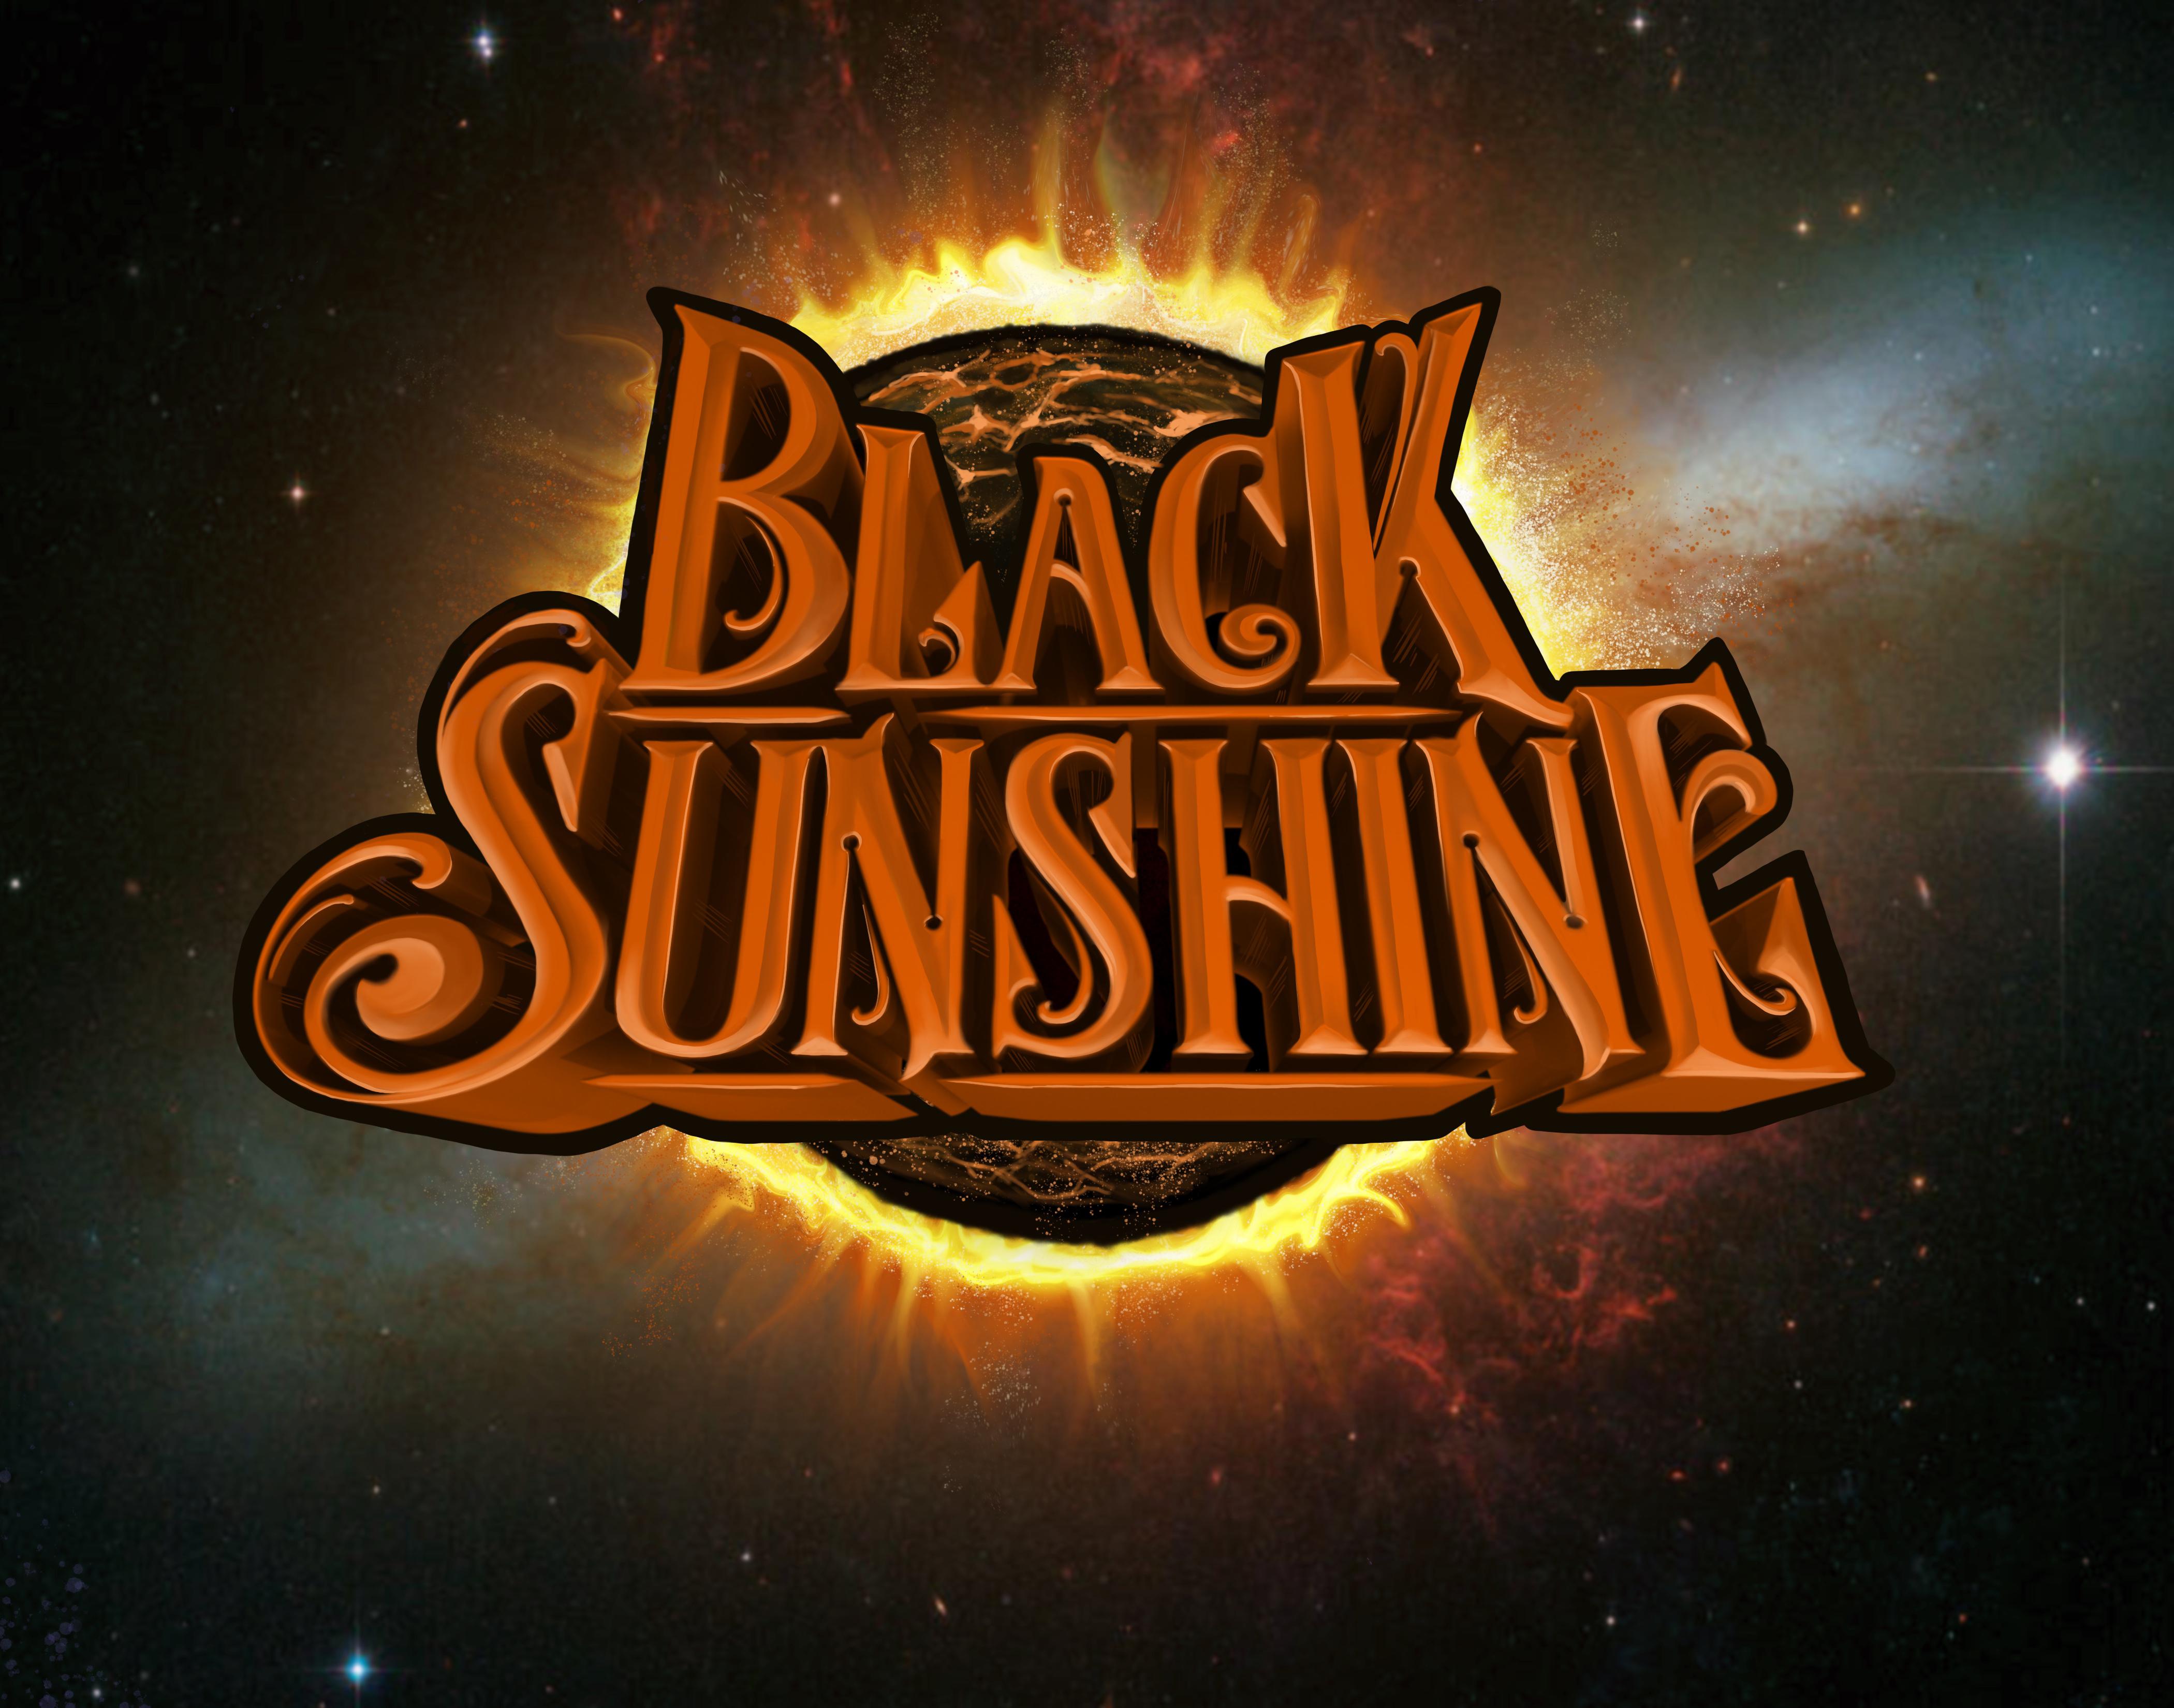 BlackSunshine_v01